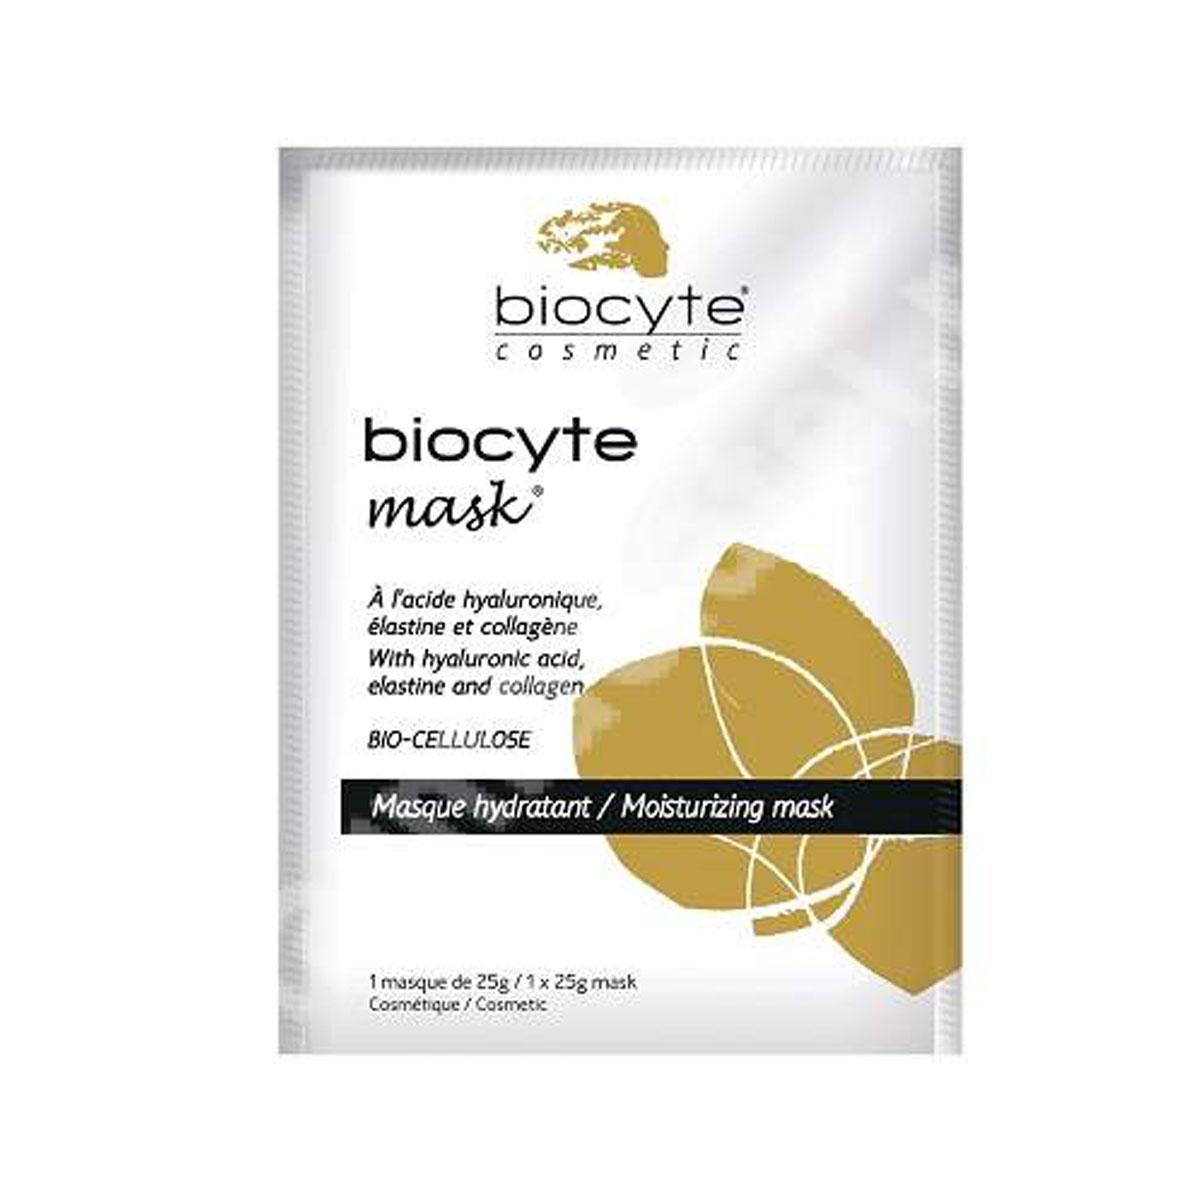 Masca hidratanta cu acid hialuronic, elastina si colagen, 25 g, Laboratoire Biocyte